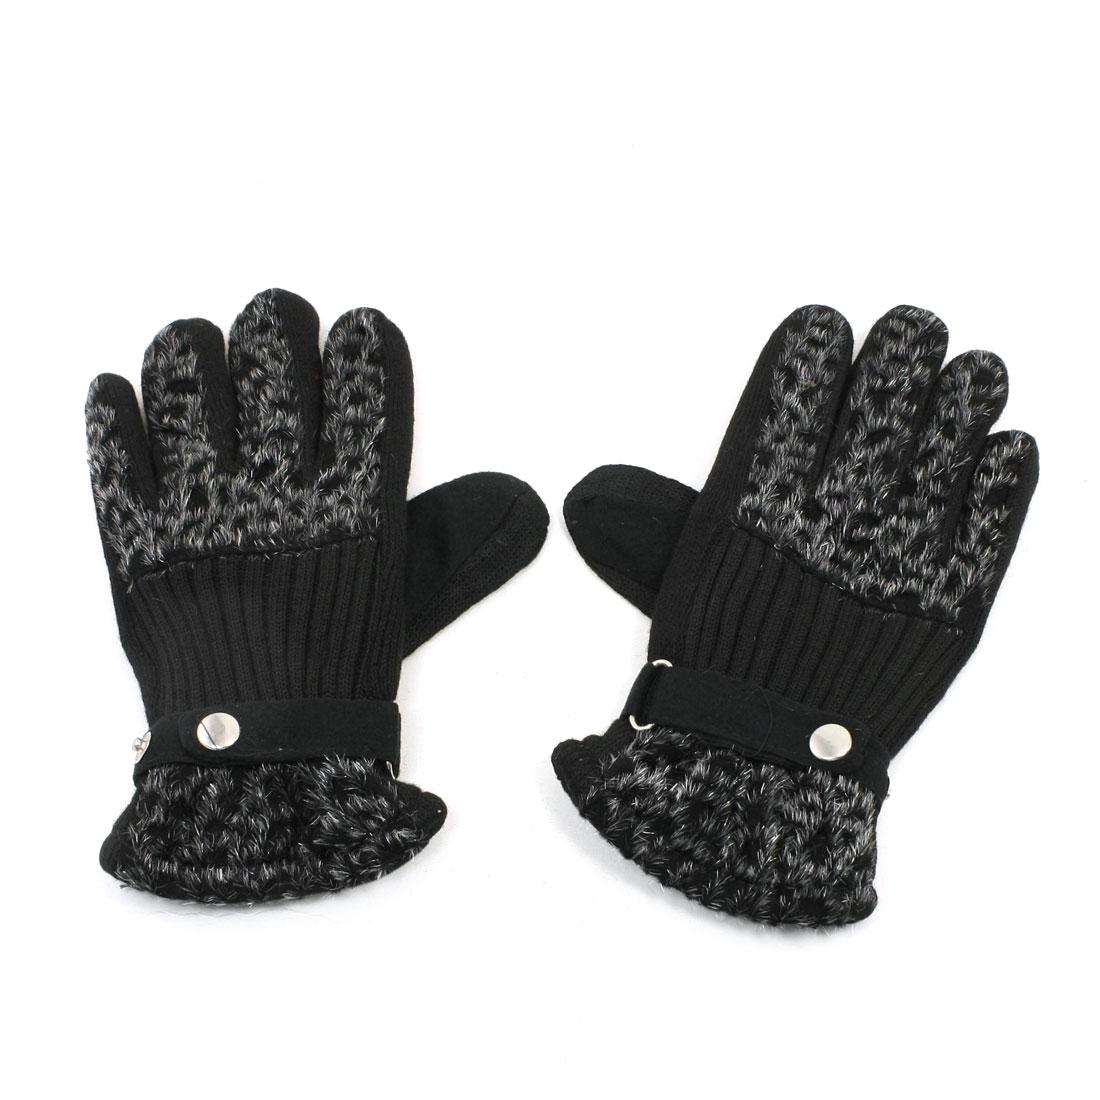 Ladies Black Leopard Pattern Full Finger Winter Warmer Gloves Pair